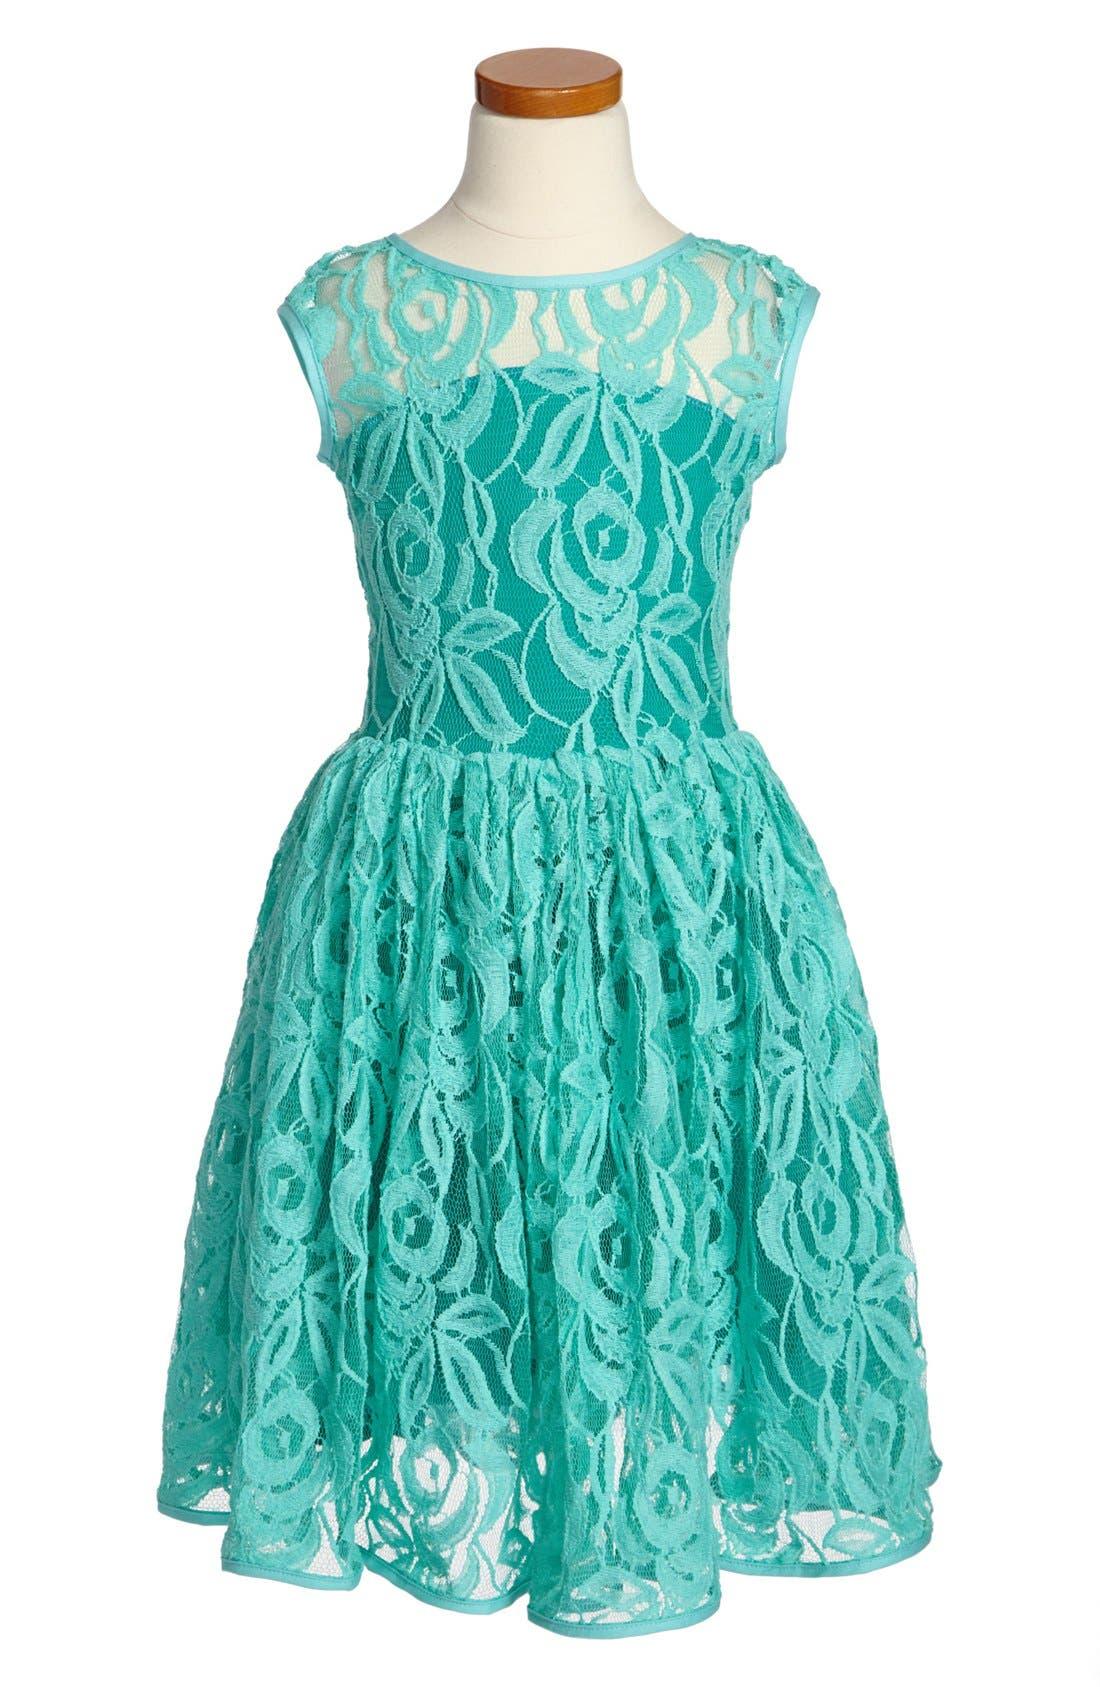 Alternate Image 1 Selected - Fiveloaves Twofish Lace Dress (Little Girls & Big Girls)